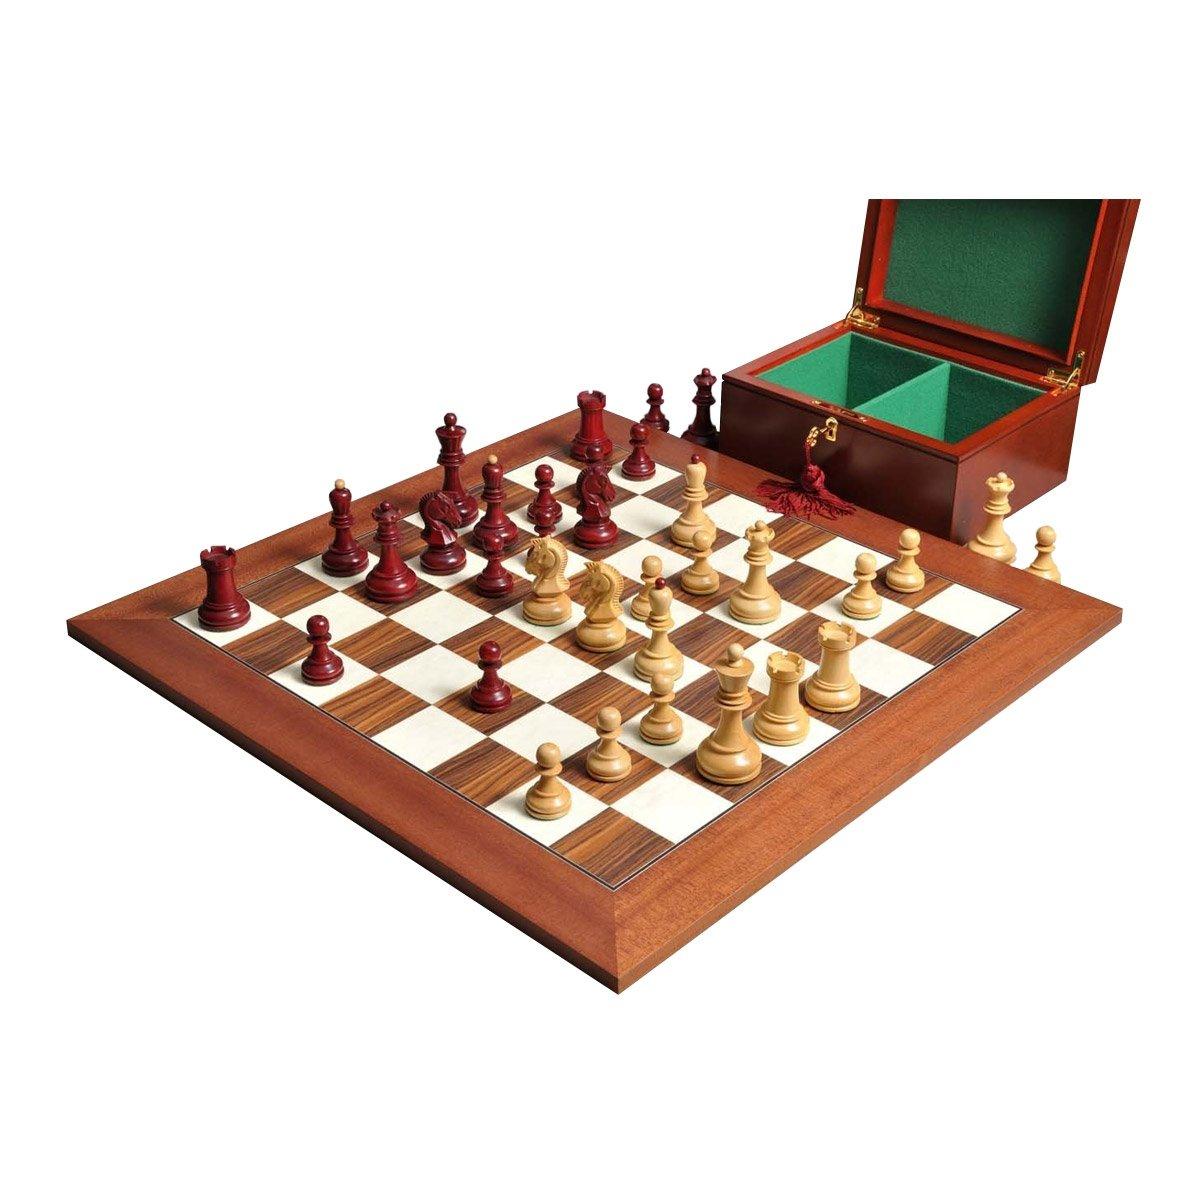 Dubrovnik チェスセット ボックス ボードコンビネーション ローズウッド 金メッキ B01MR34HBT